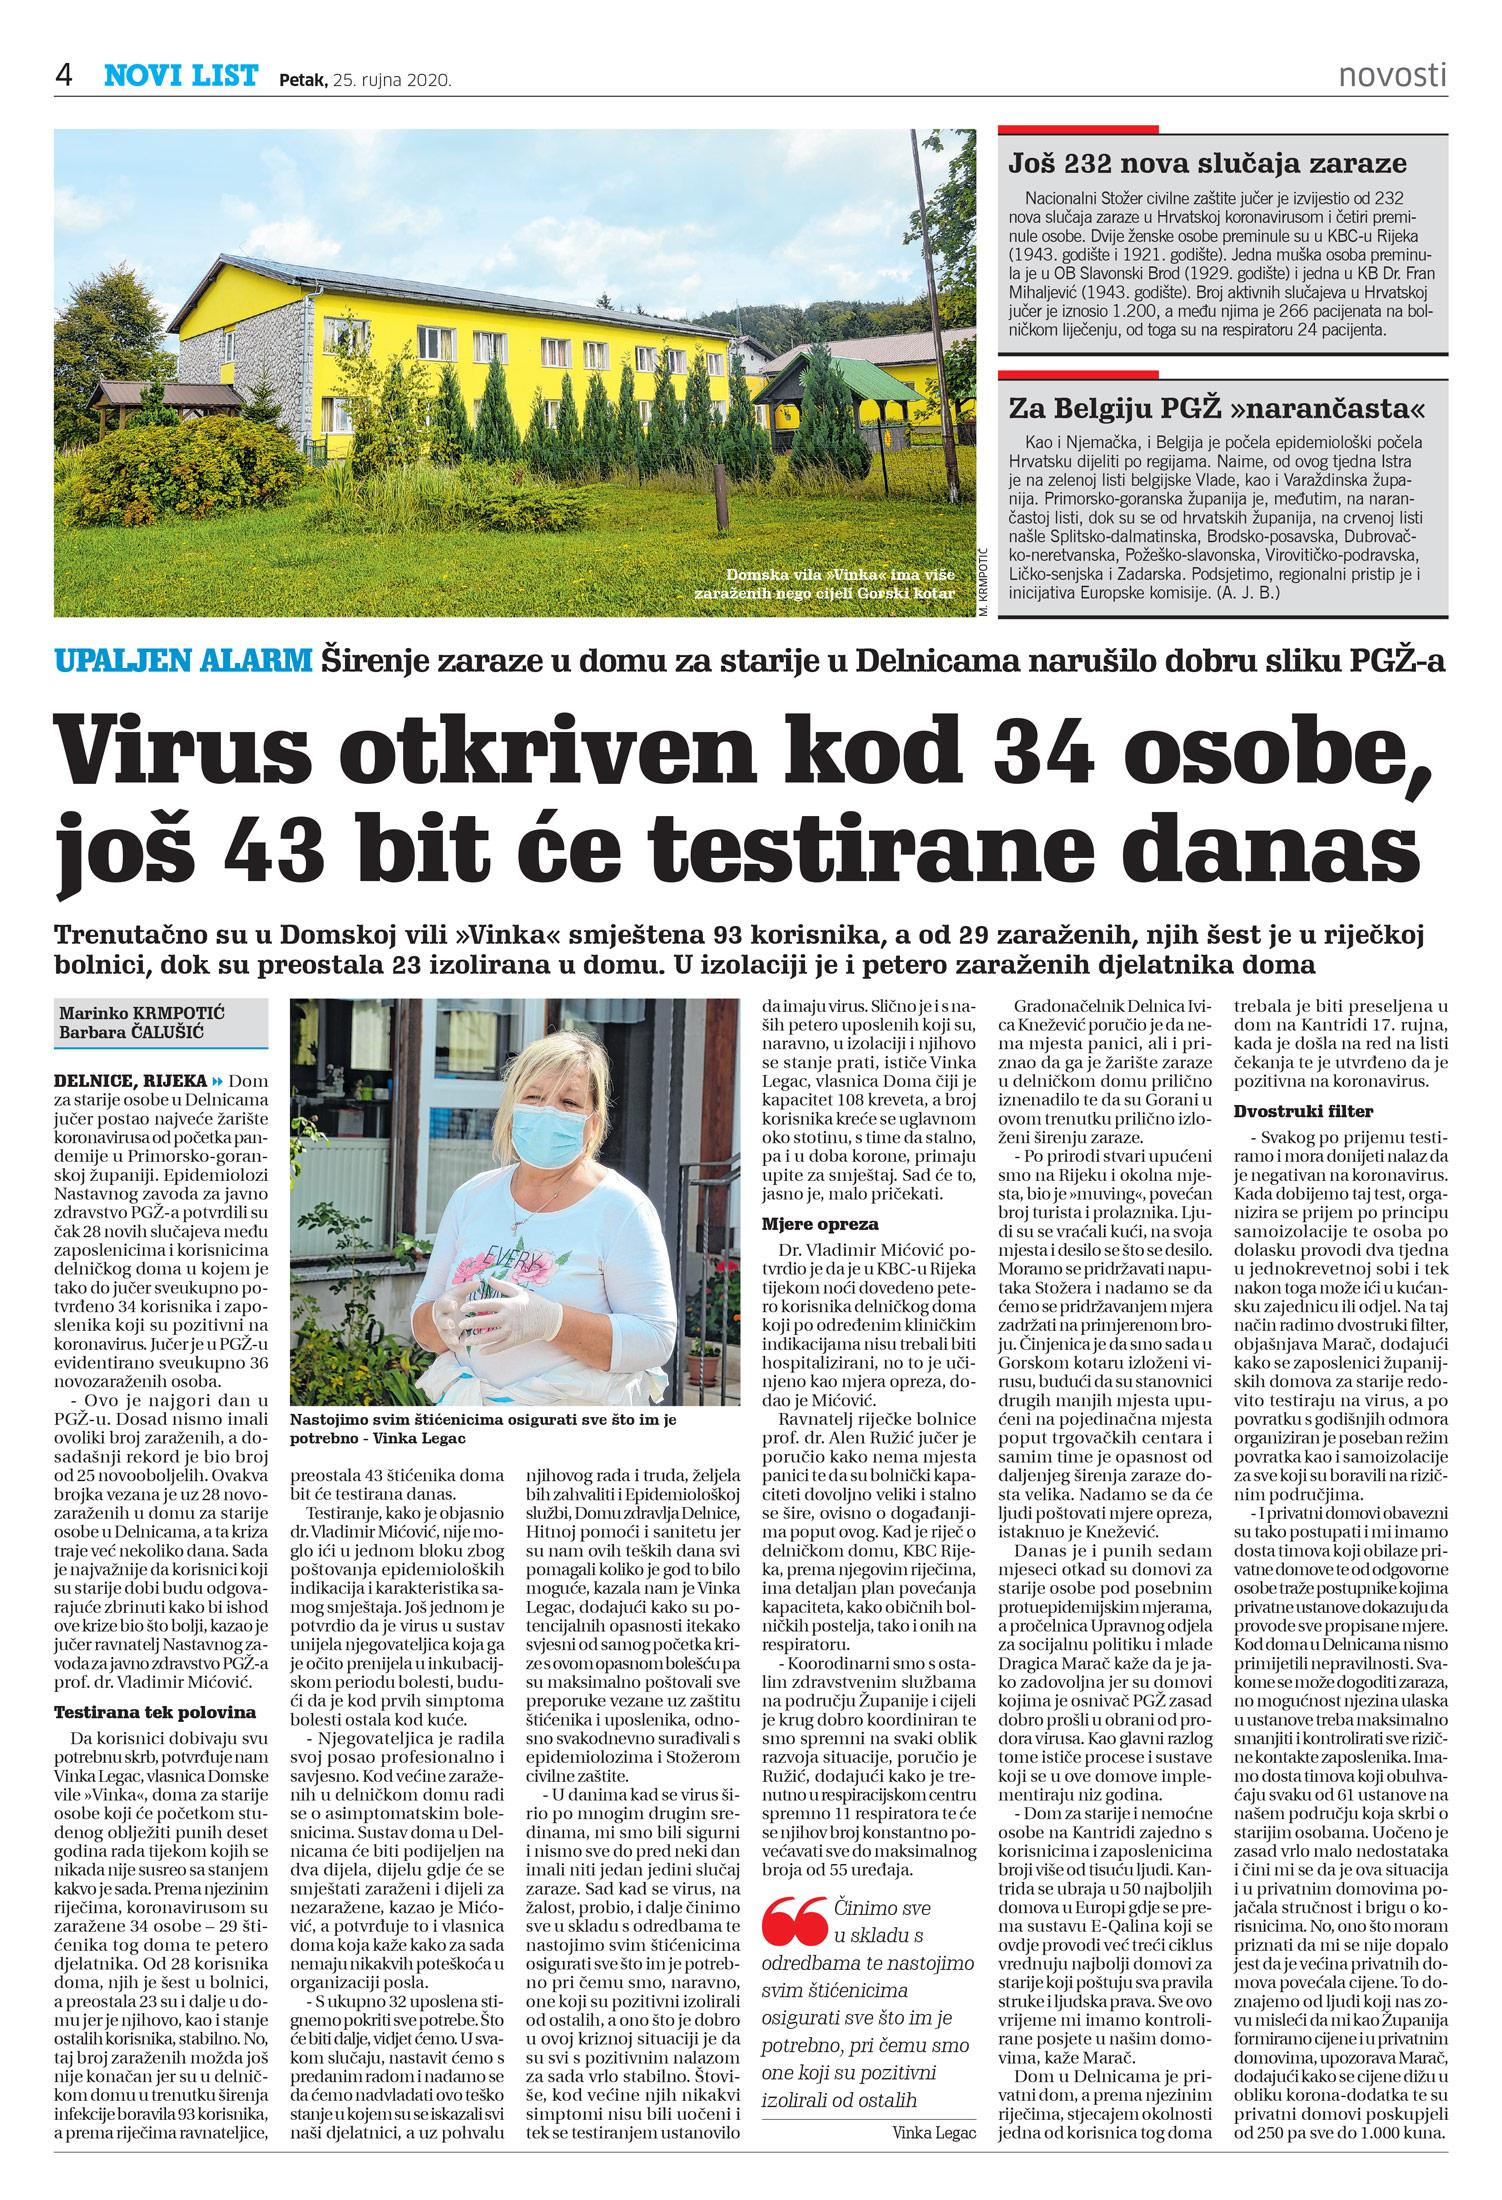 članak, novi list, covid19 virus, starački dom delnice